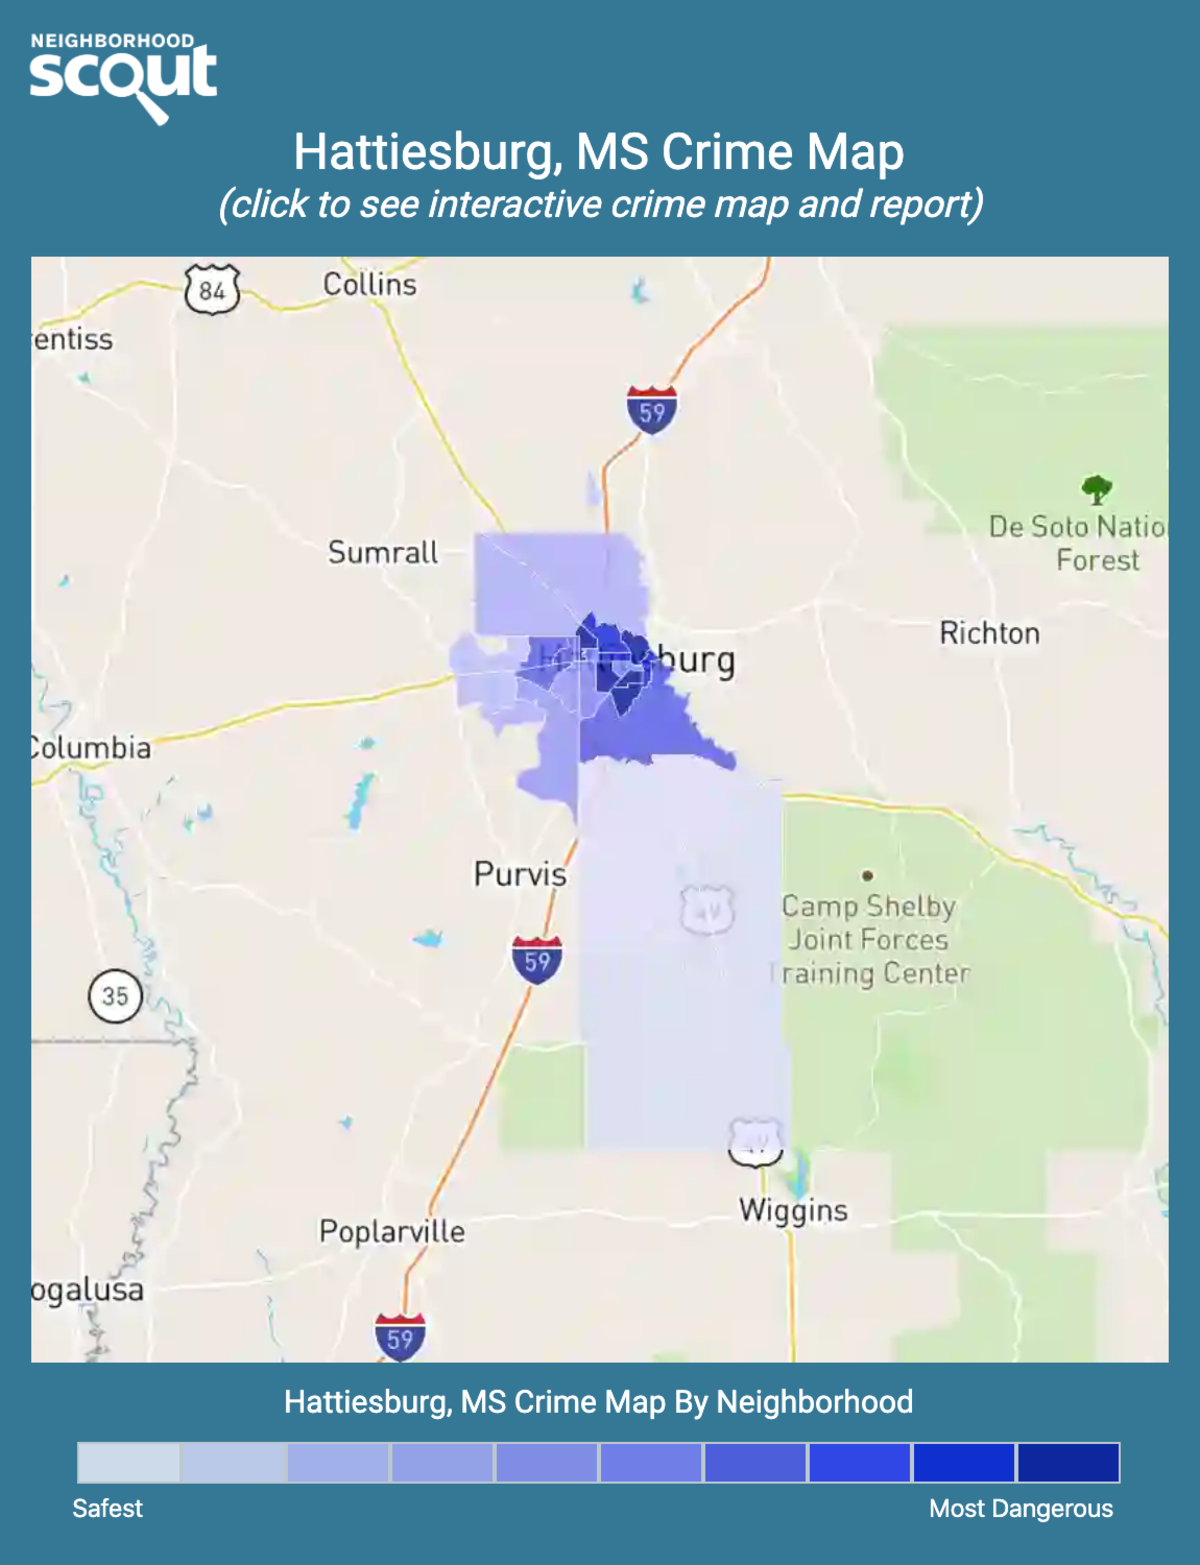 Hattiesburg, Mississippi crime map